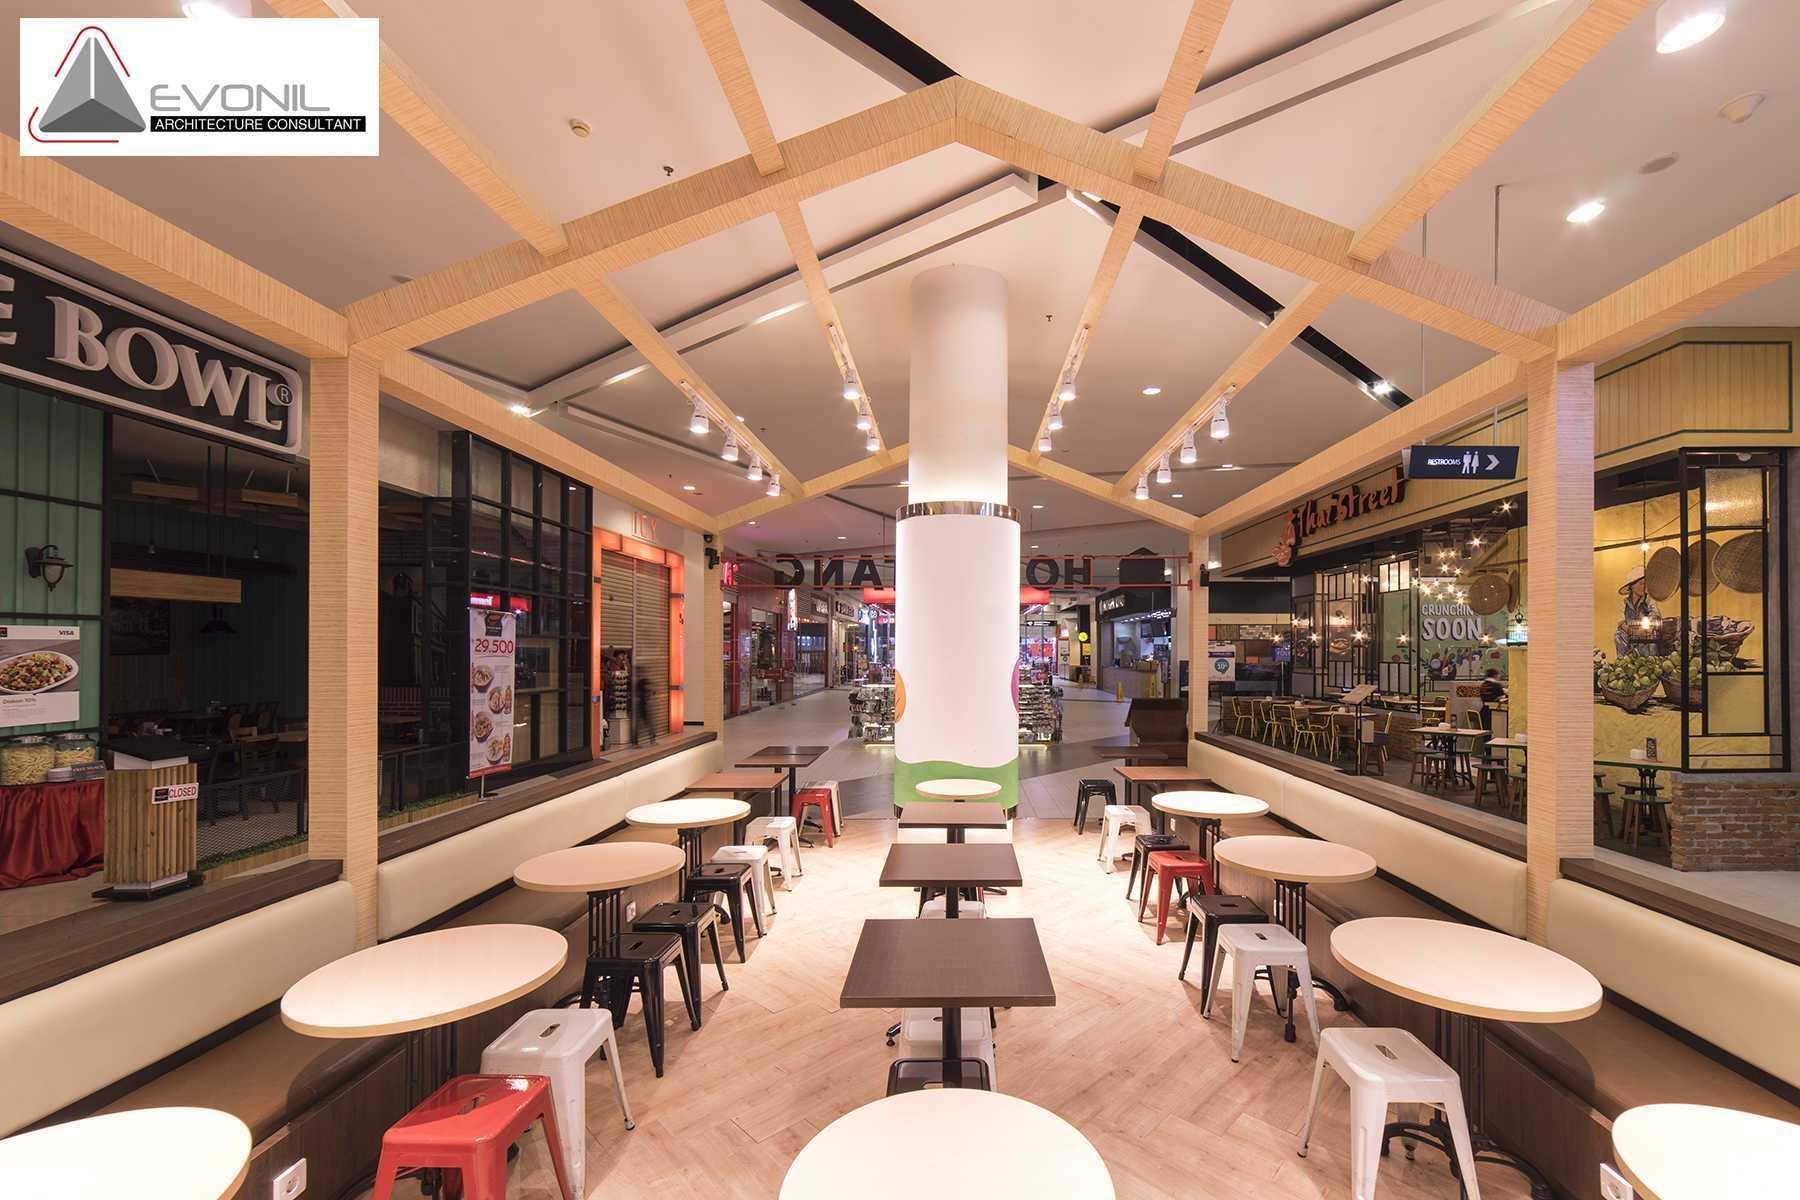 Evonil Architecture Hong Tang Dessert Cafe - Gandaria City Mall Jakarta, Daerah Khusus Ibukota Jakarta, Indonesia Jakarta, Daerah Khusus Ibukota Jakarta, Indonesia Hong Tang Gandaria City Mall Evonil Architecture Scandinavian 61375